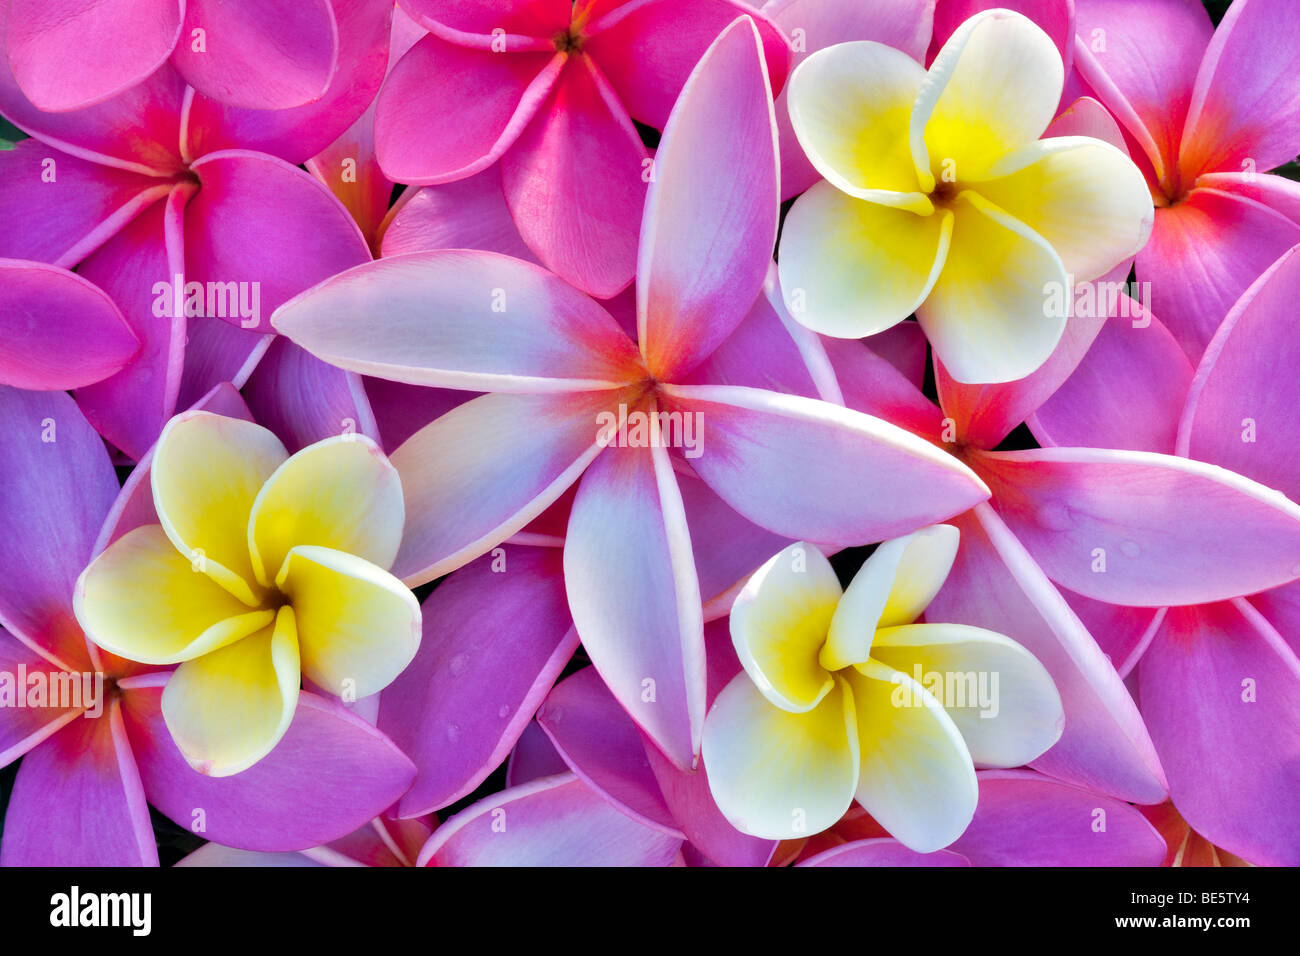 Red and yellow plumeria or frangipani. Kauai, Hawaii. - Stock Image